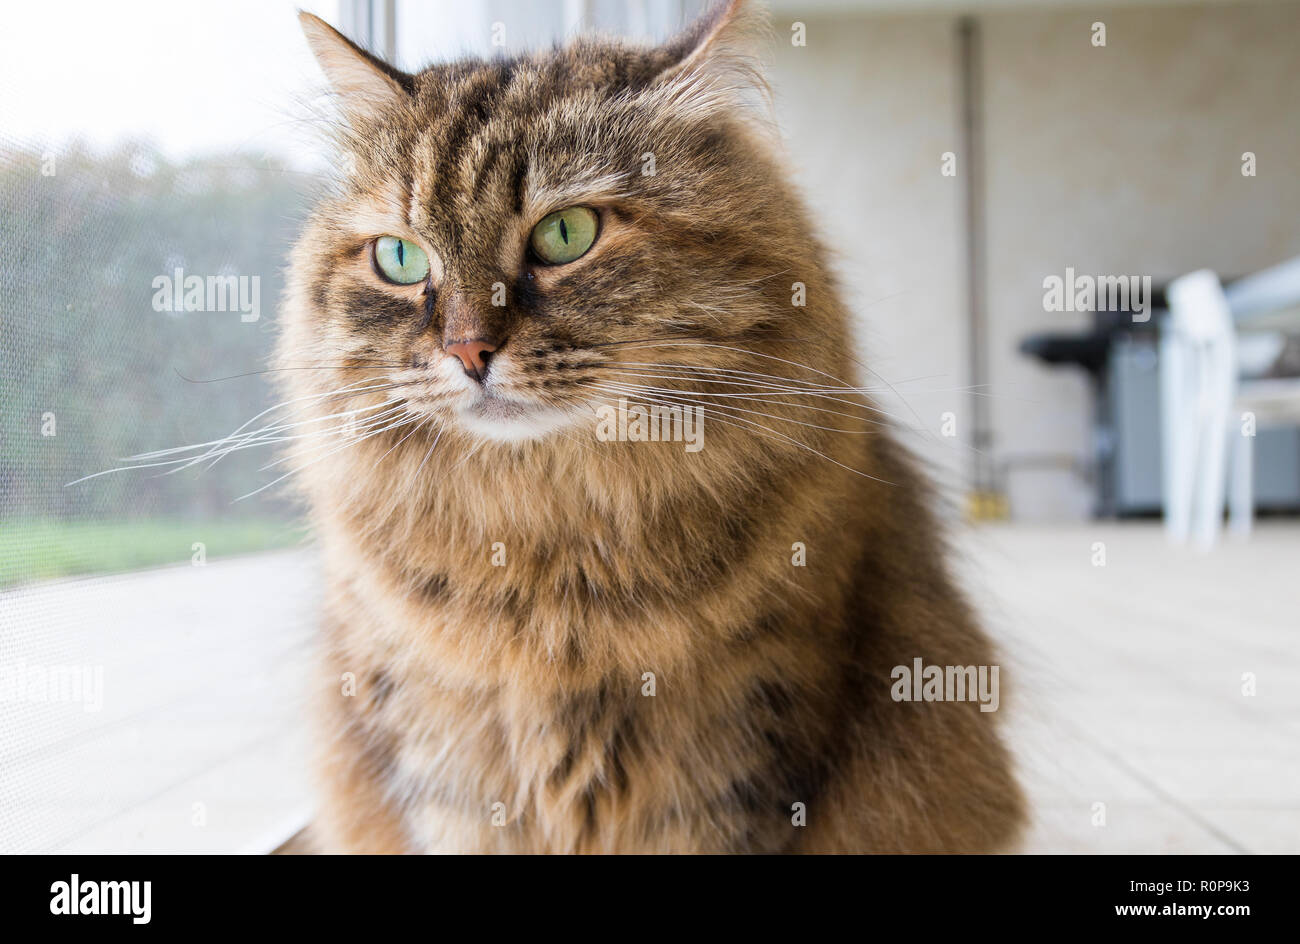 Curious livestock cat looking outdoor, funny pet Stock Photo